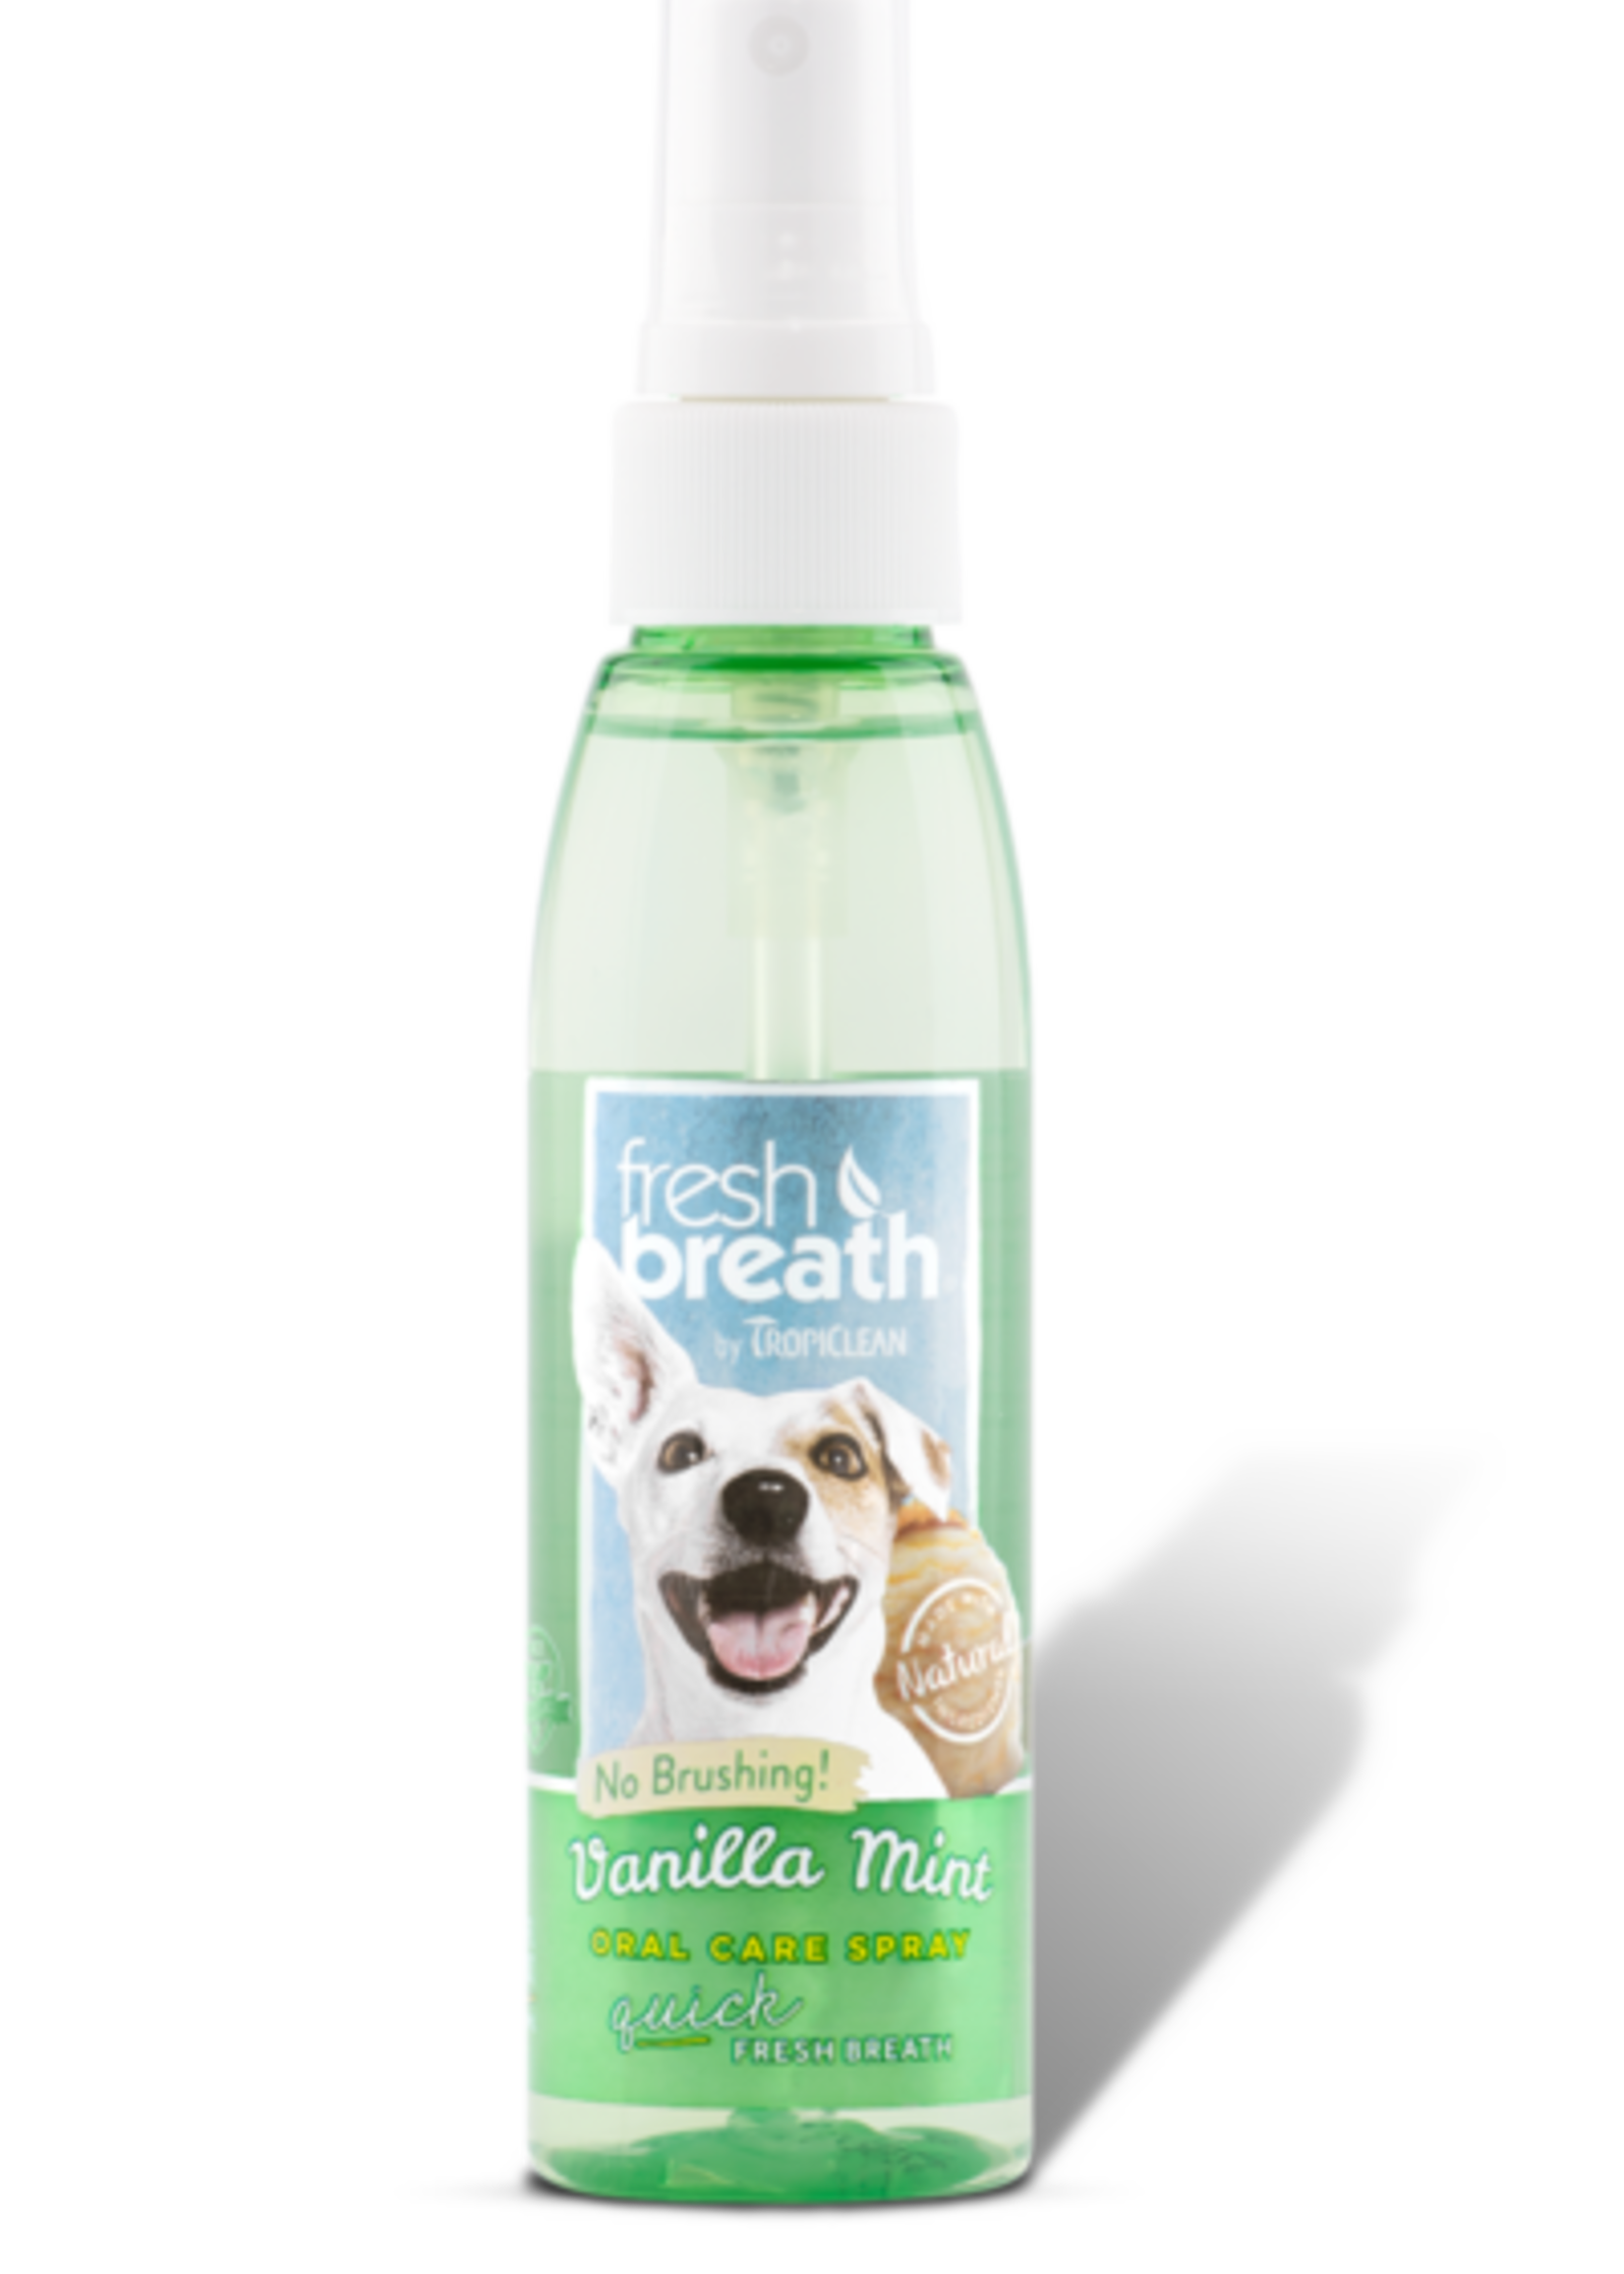 Tropiclean Manufacturing TropiClean Dog Fresh Breath Oral Spray Vanilla Mint 4 oz